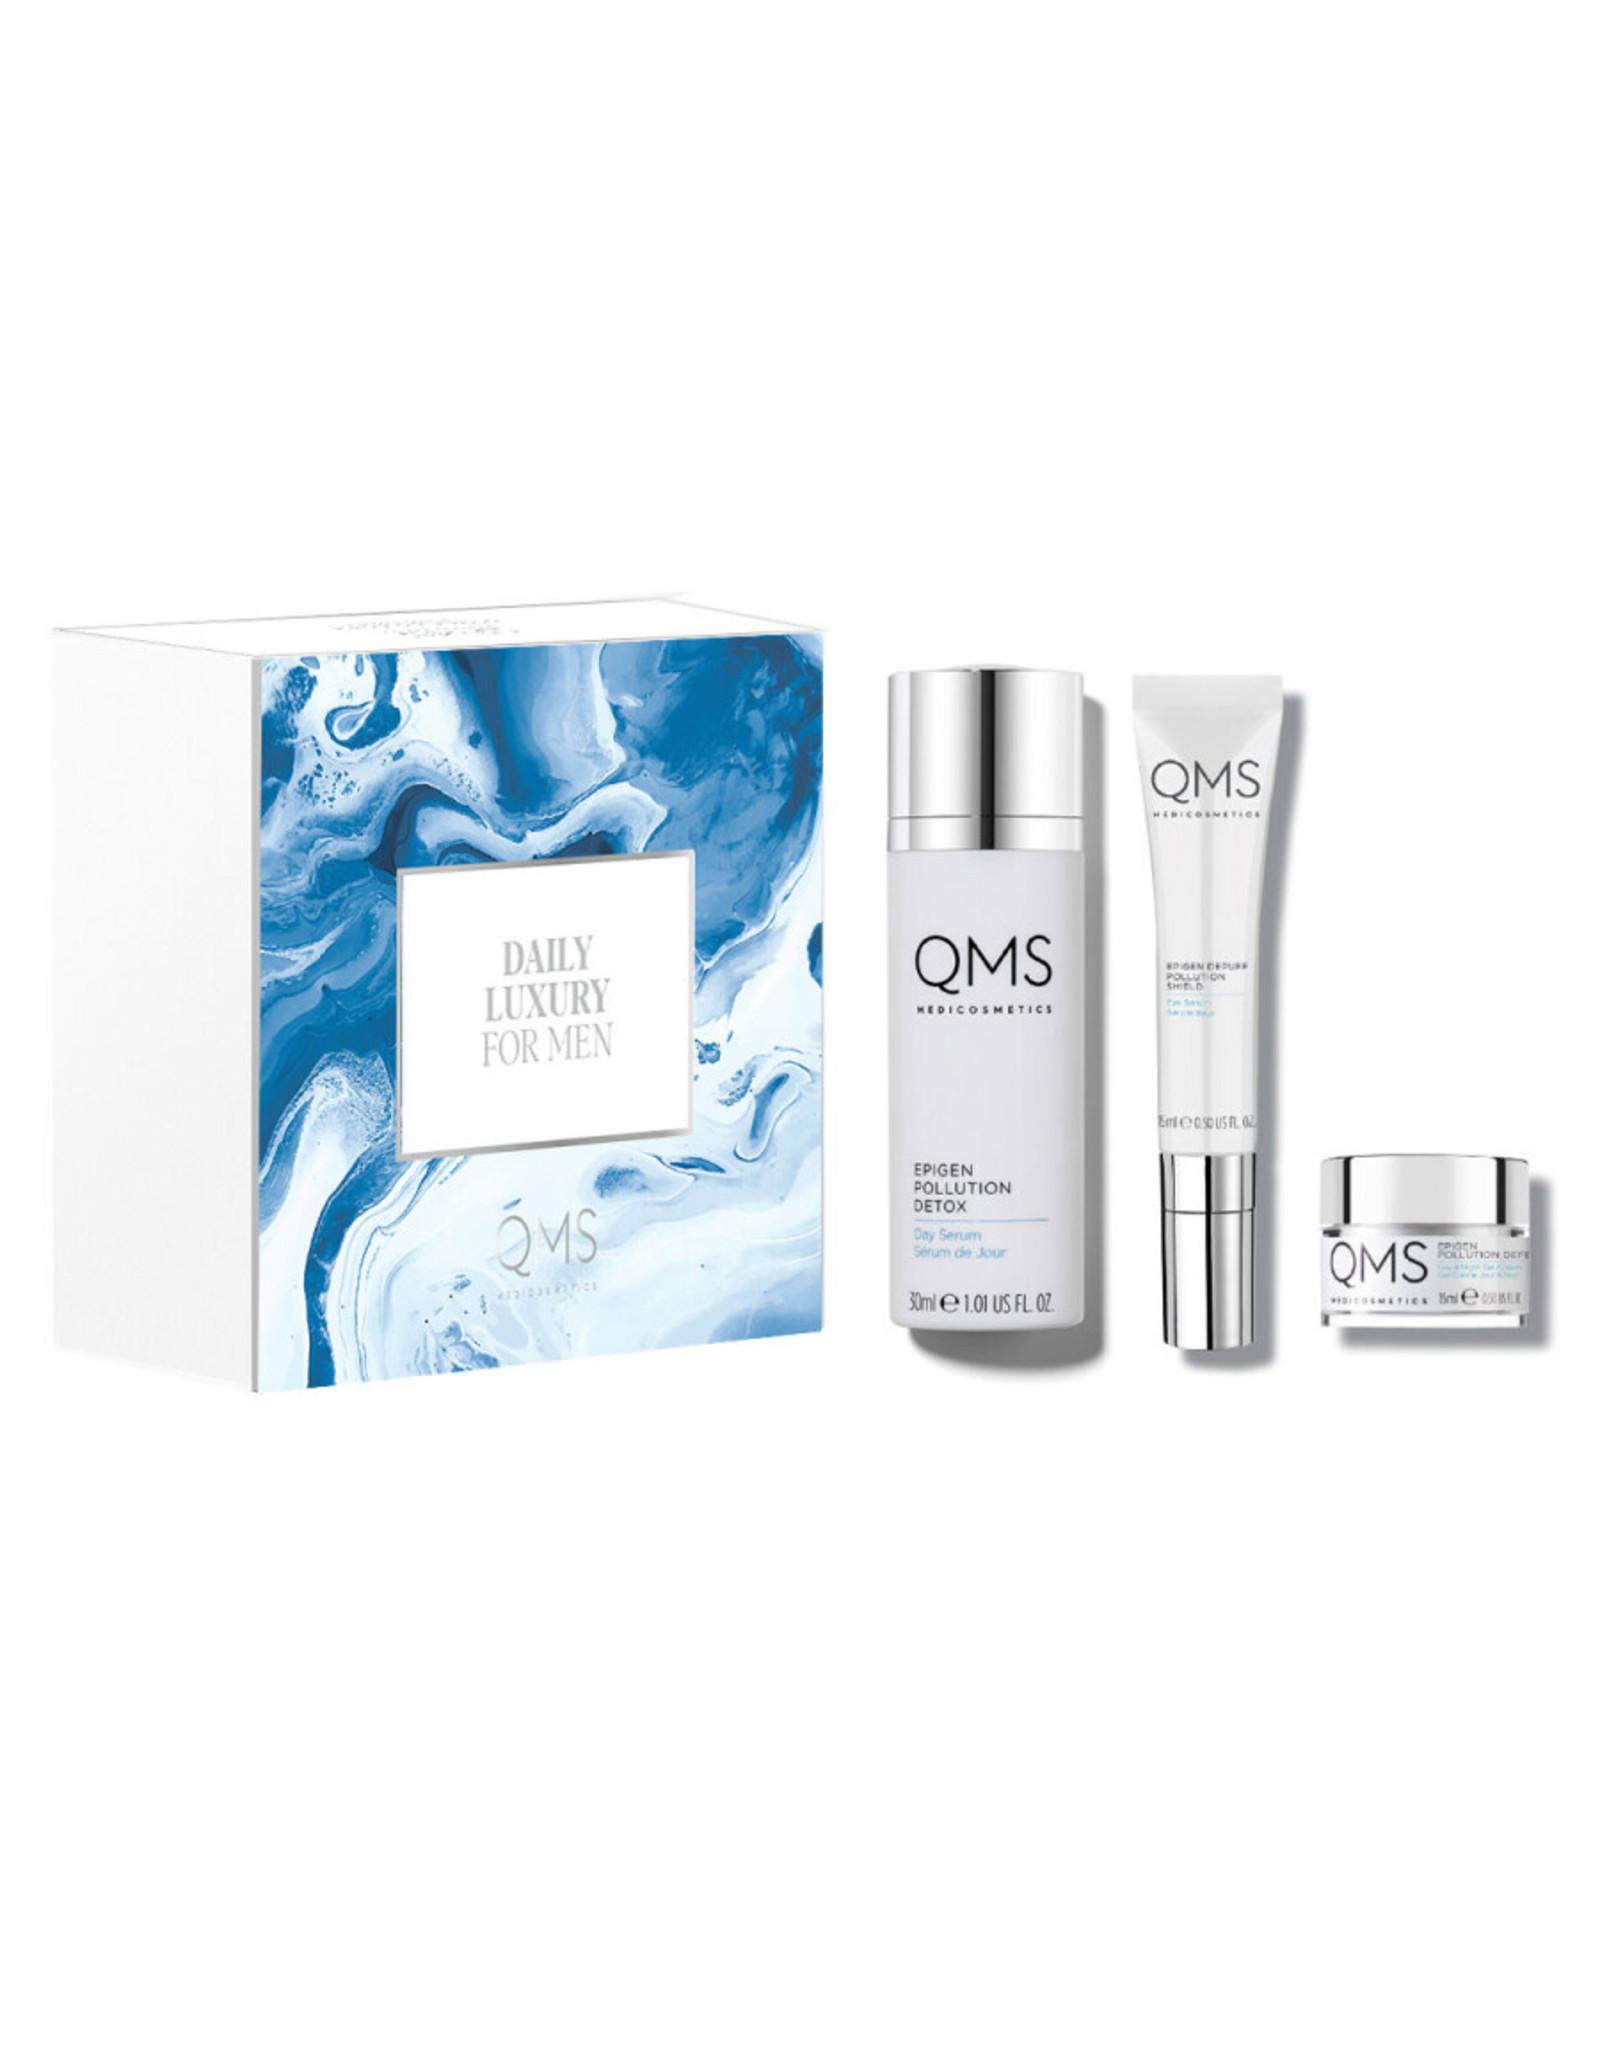 QMS Medicosmetics Daily Luxury For Men